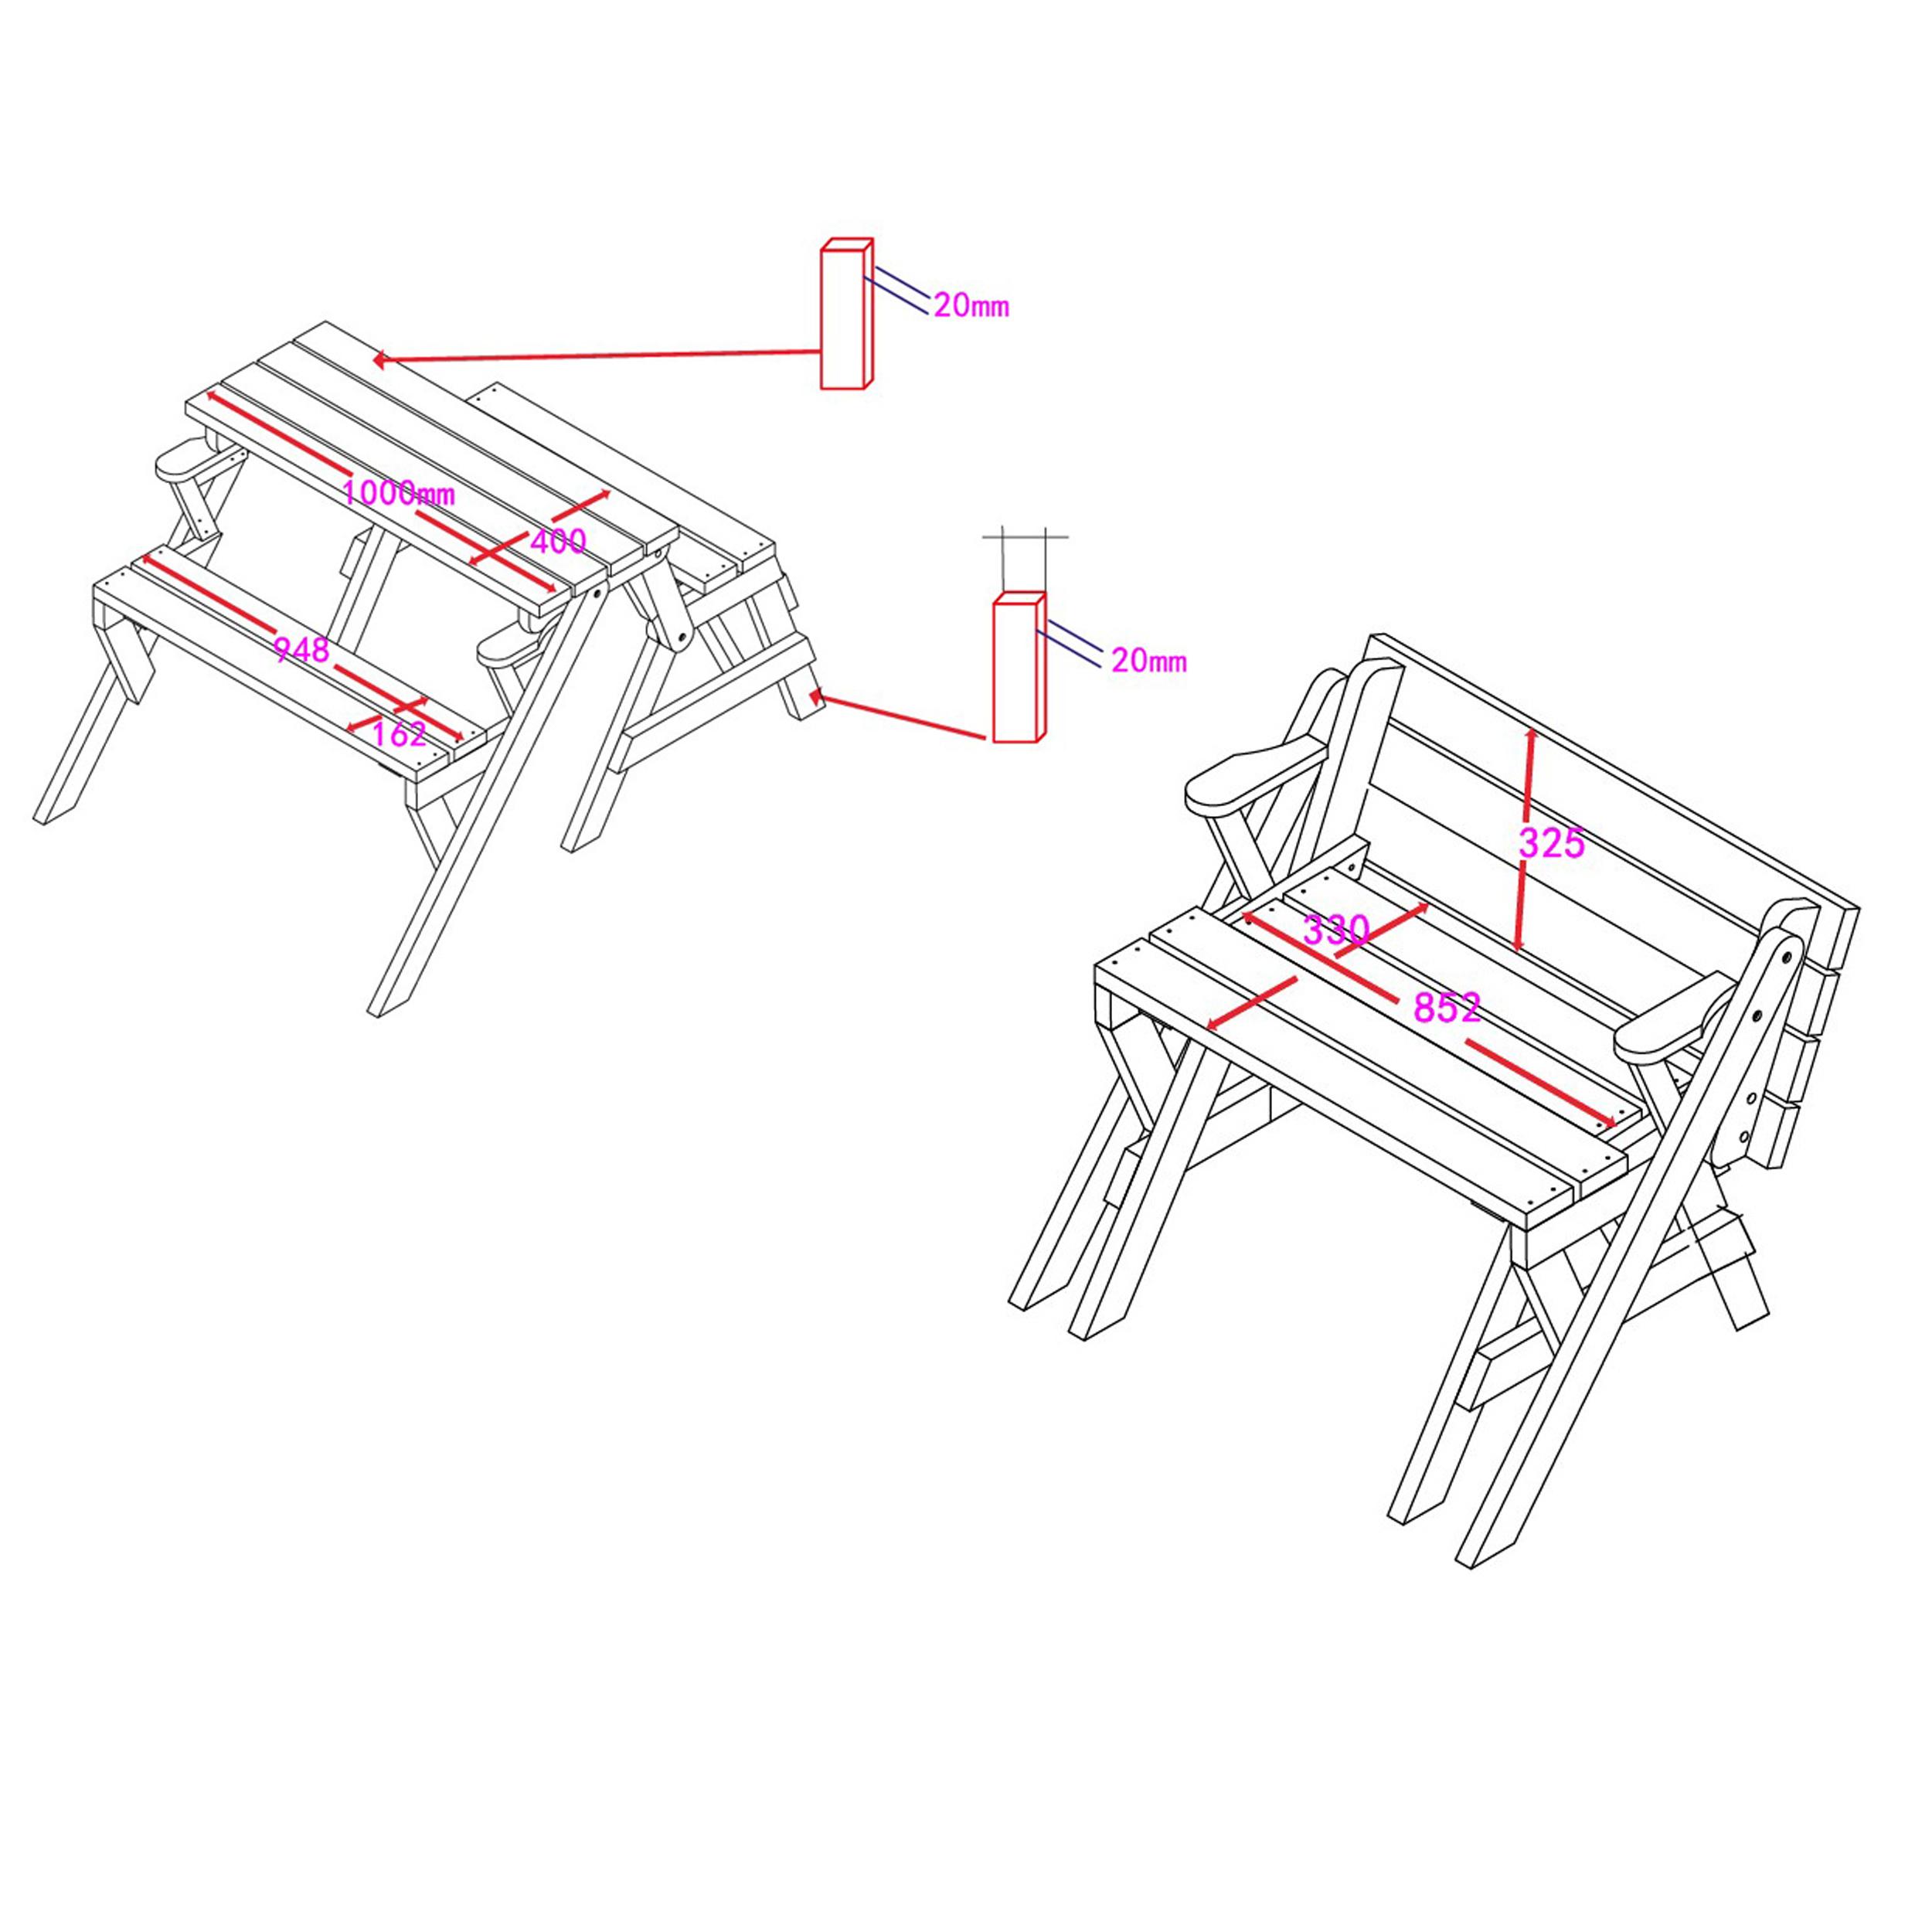 Kinderpicknickbank bunt - klappbar - Skizze mit Maßen